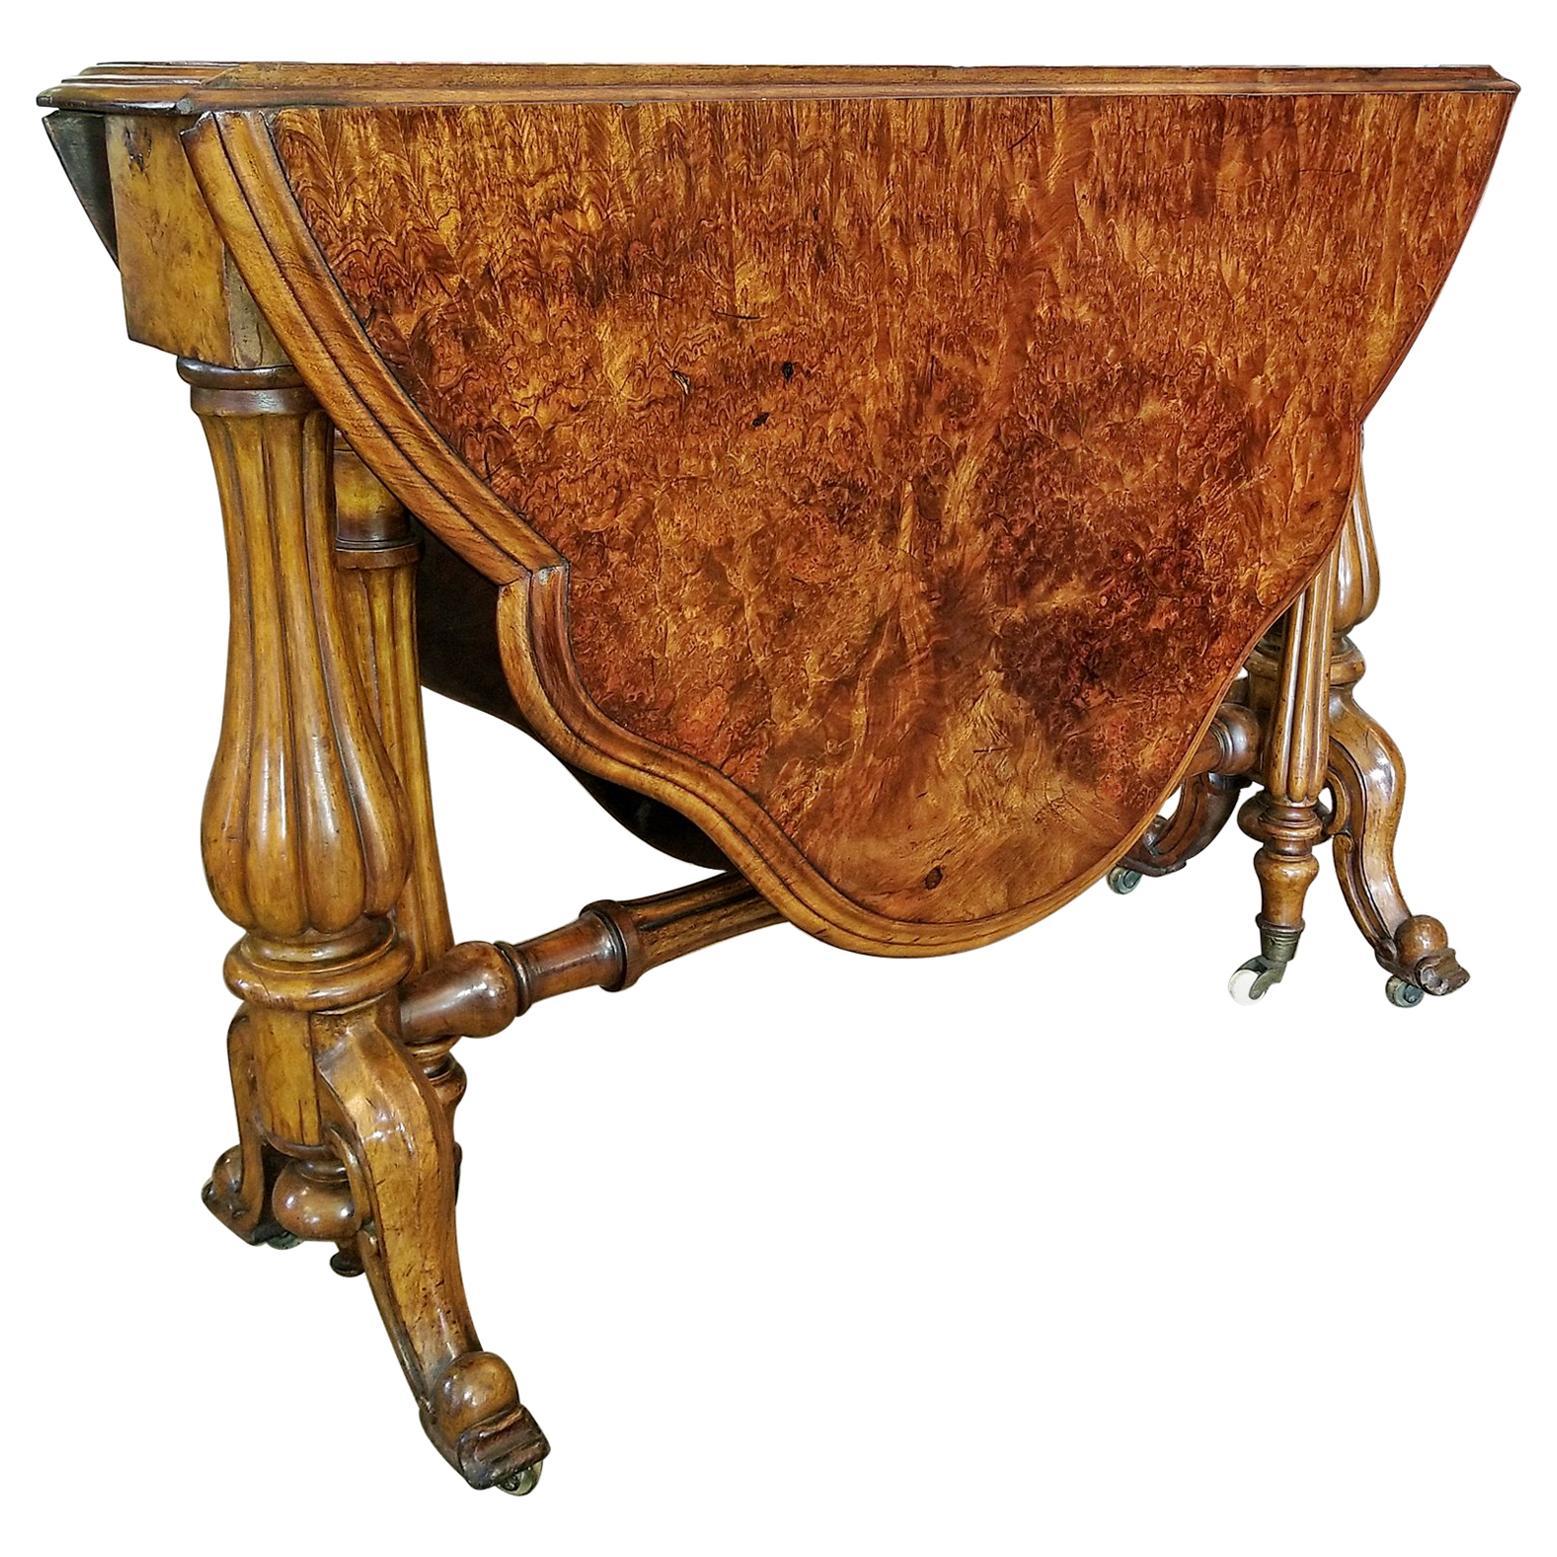 19th Century English Burl Walnut Sutherland Table